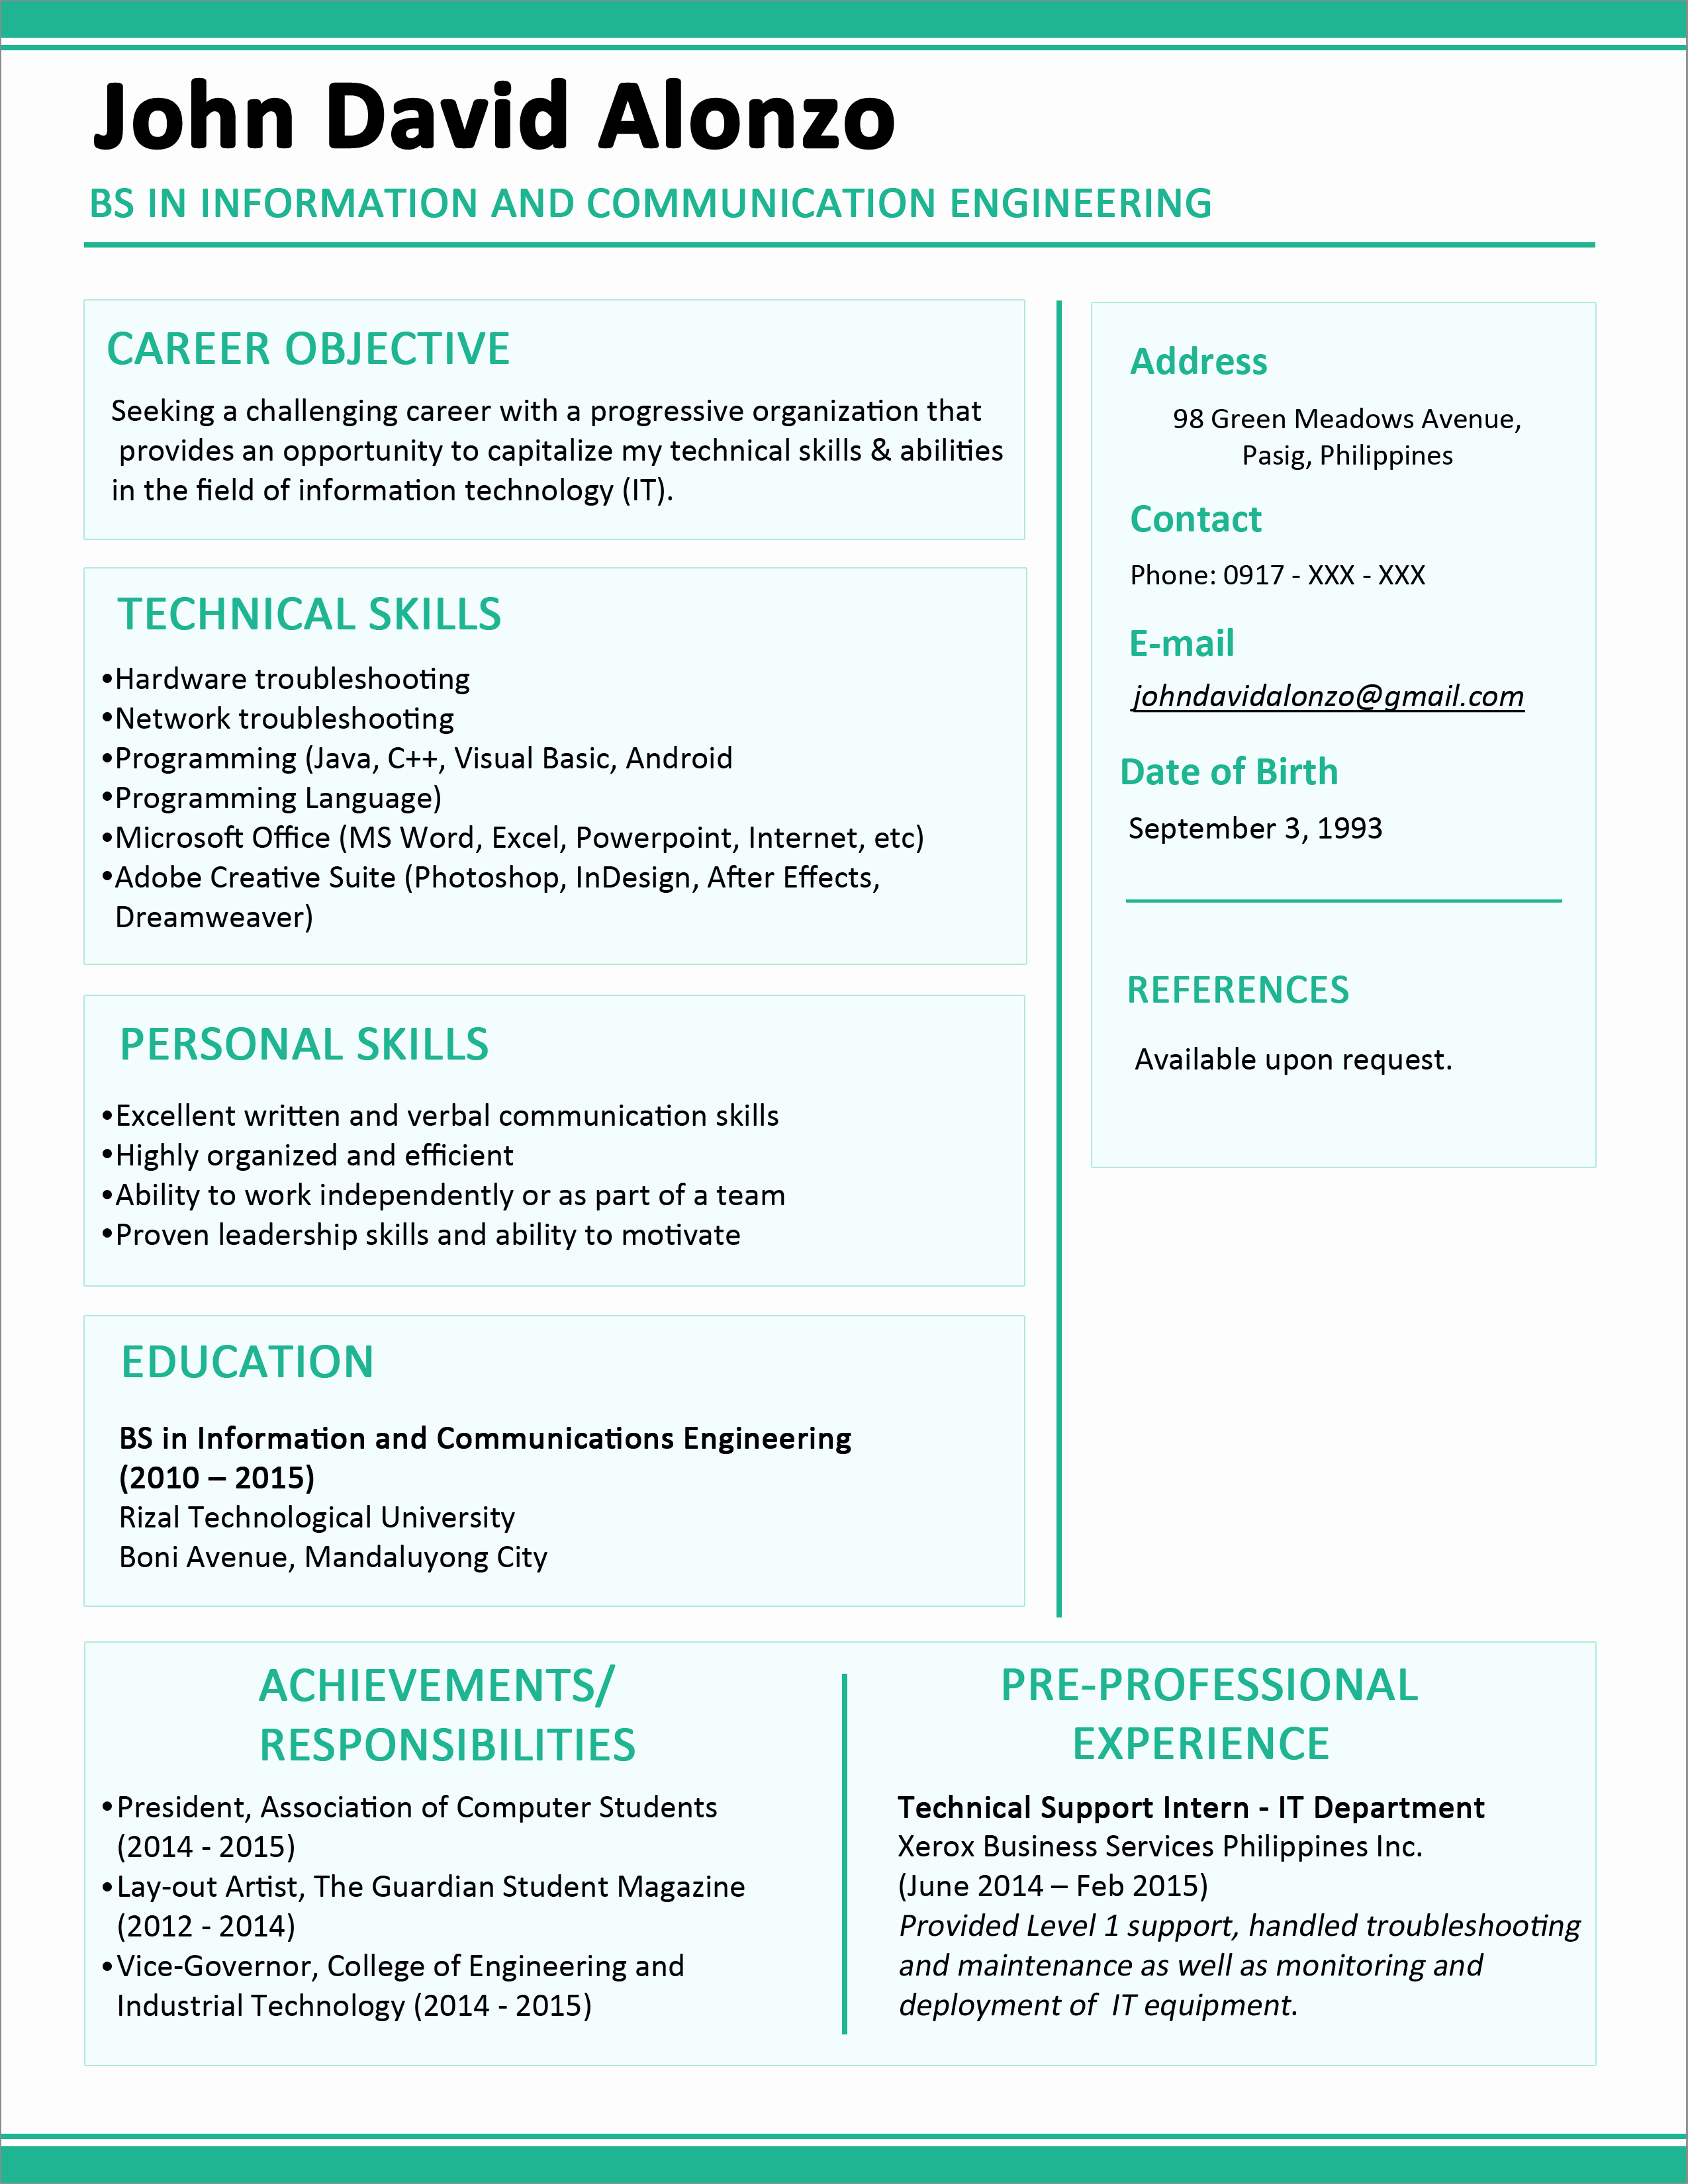 Resume Template for New Graduates Fresh Sample Resume format for Fresh Graduates E Page format